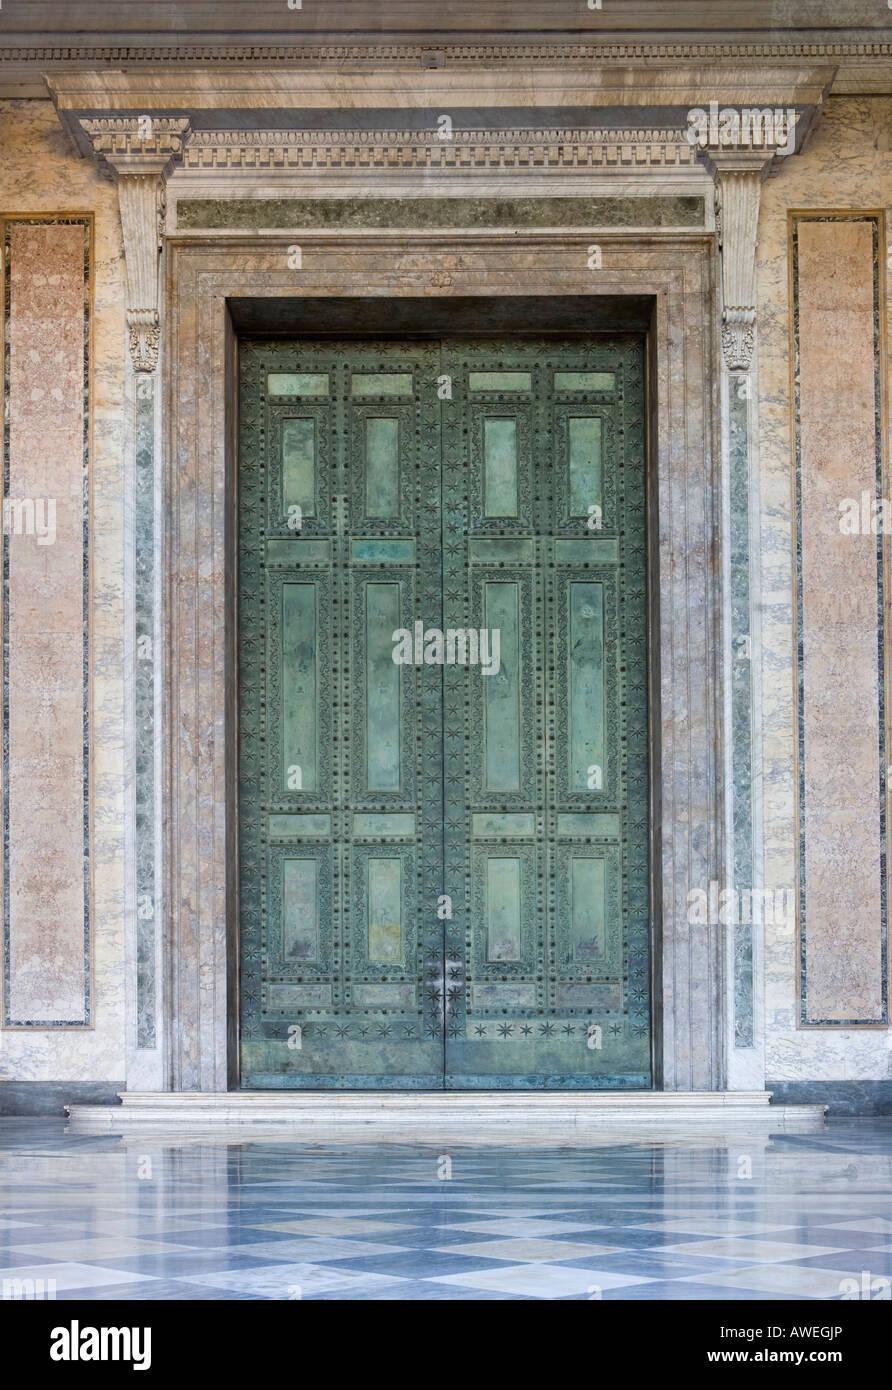 Bronze Doors Leading To The Ancient Curia At Basilica Of St John Lateran Rome Italy Europe & John Doors u0026 pezcame.com